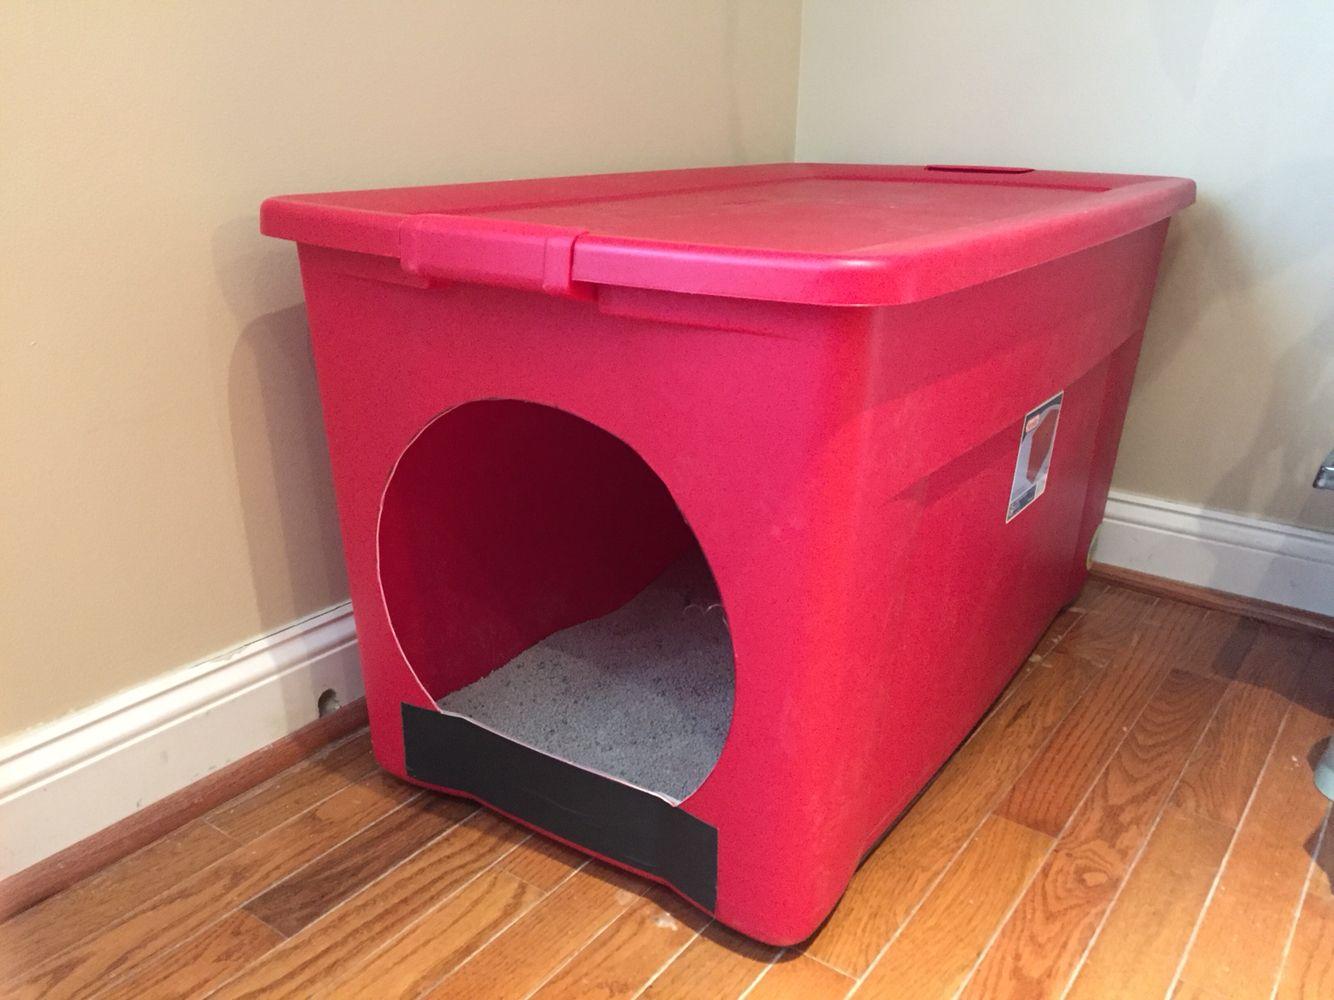 Large Cat Litter Box Kittyu0027s Wonderbox Disposable Cat